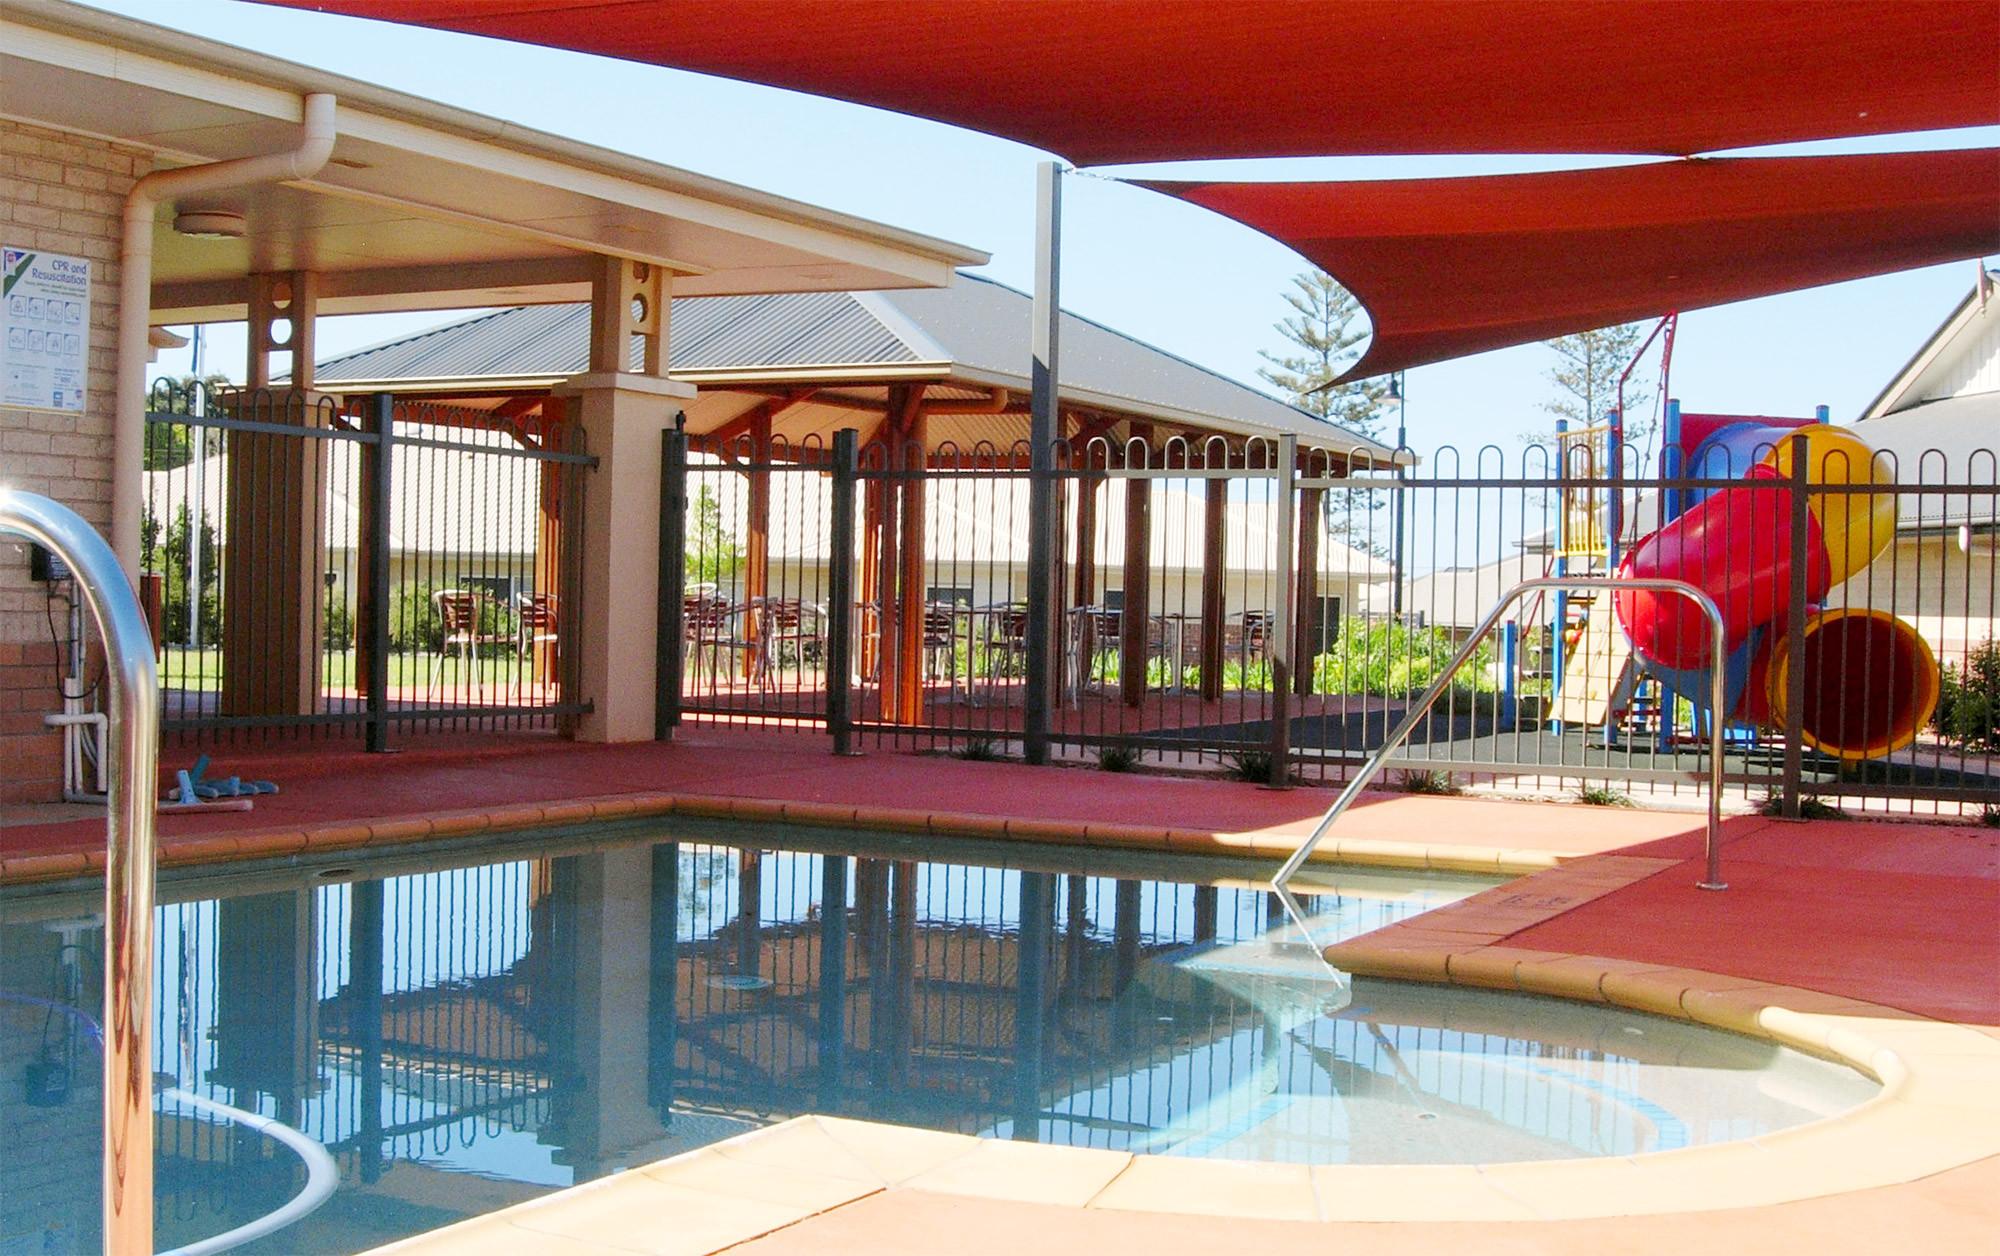 Pool and playground